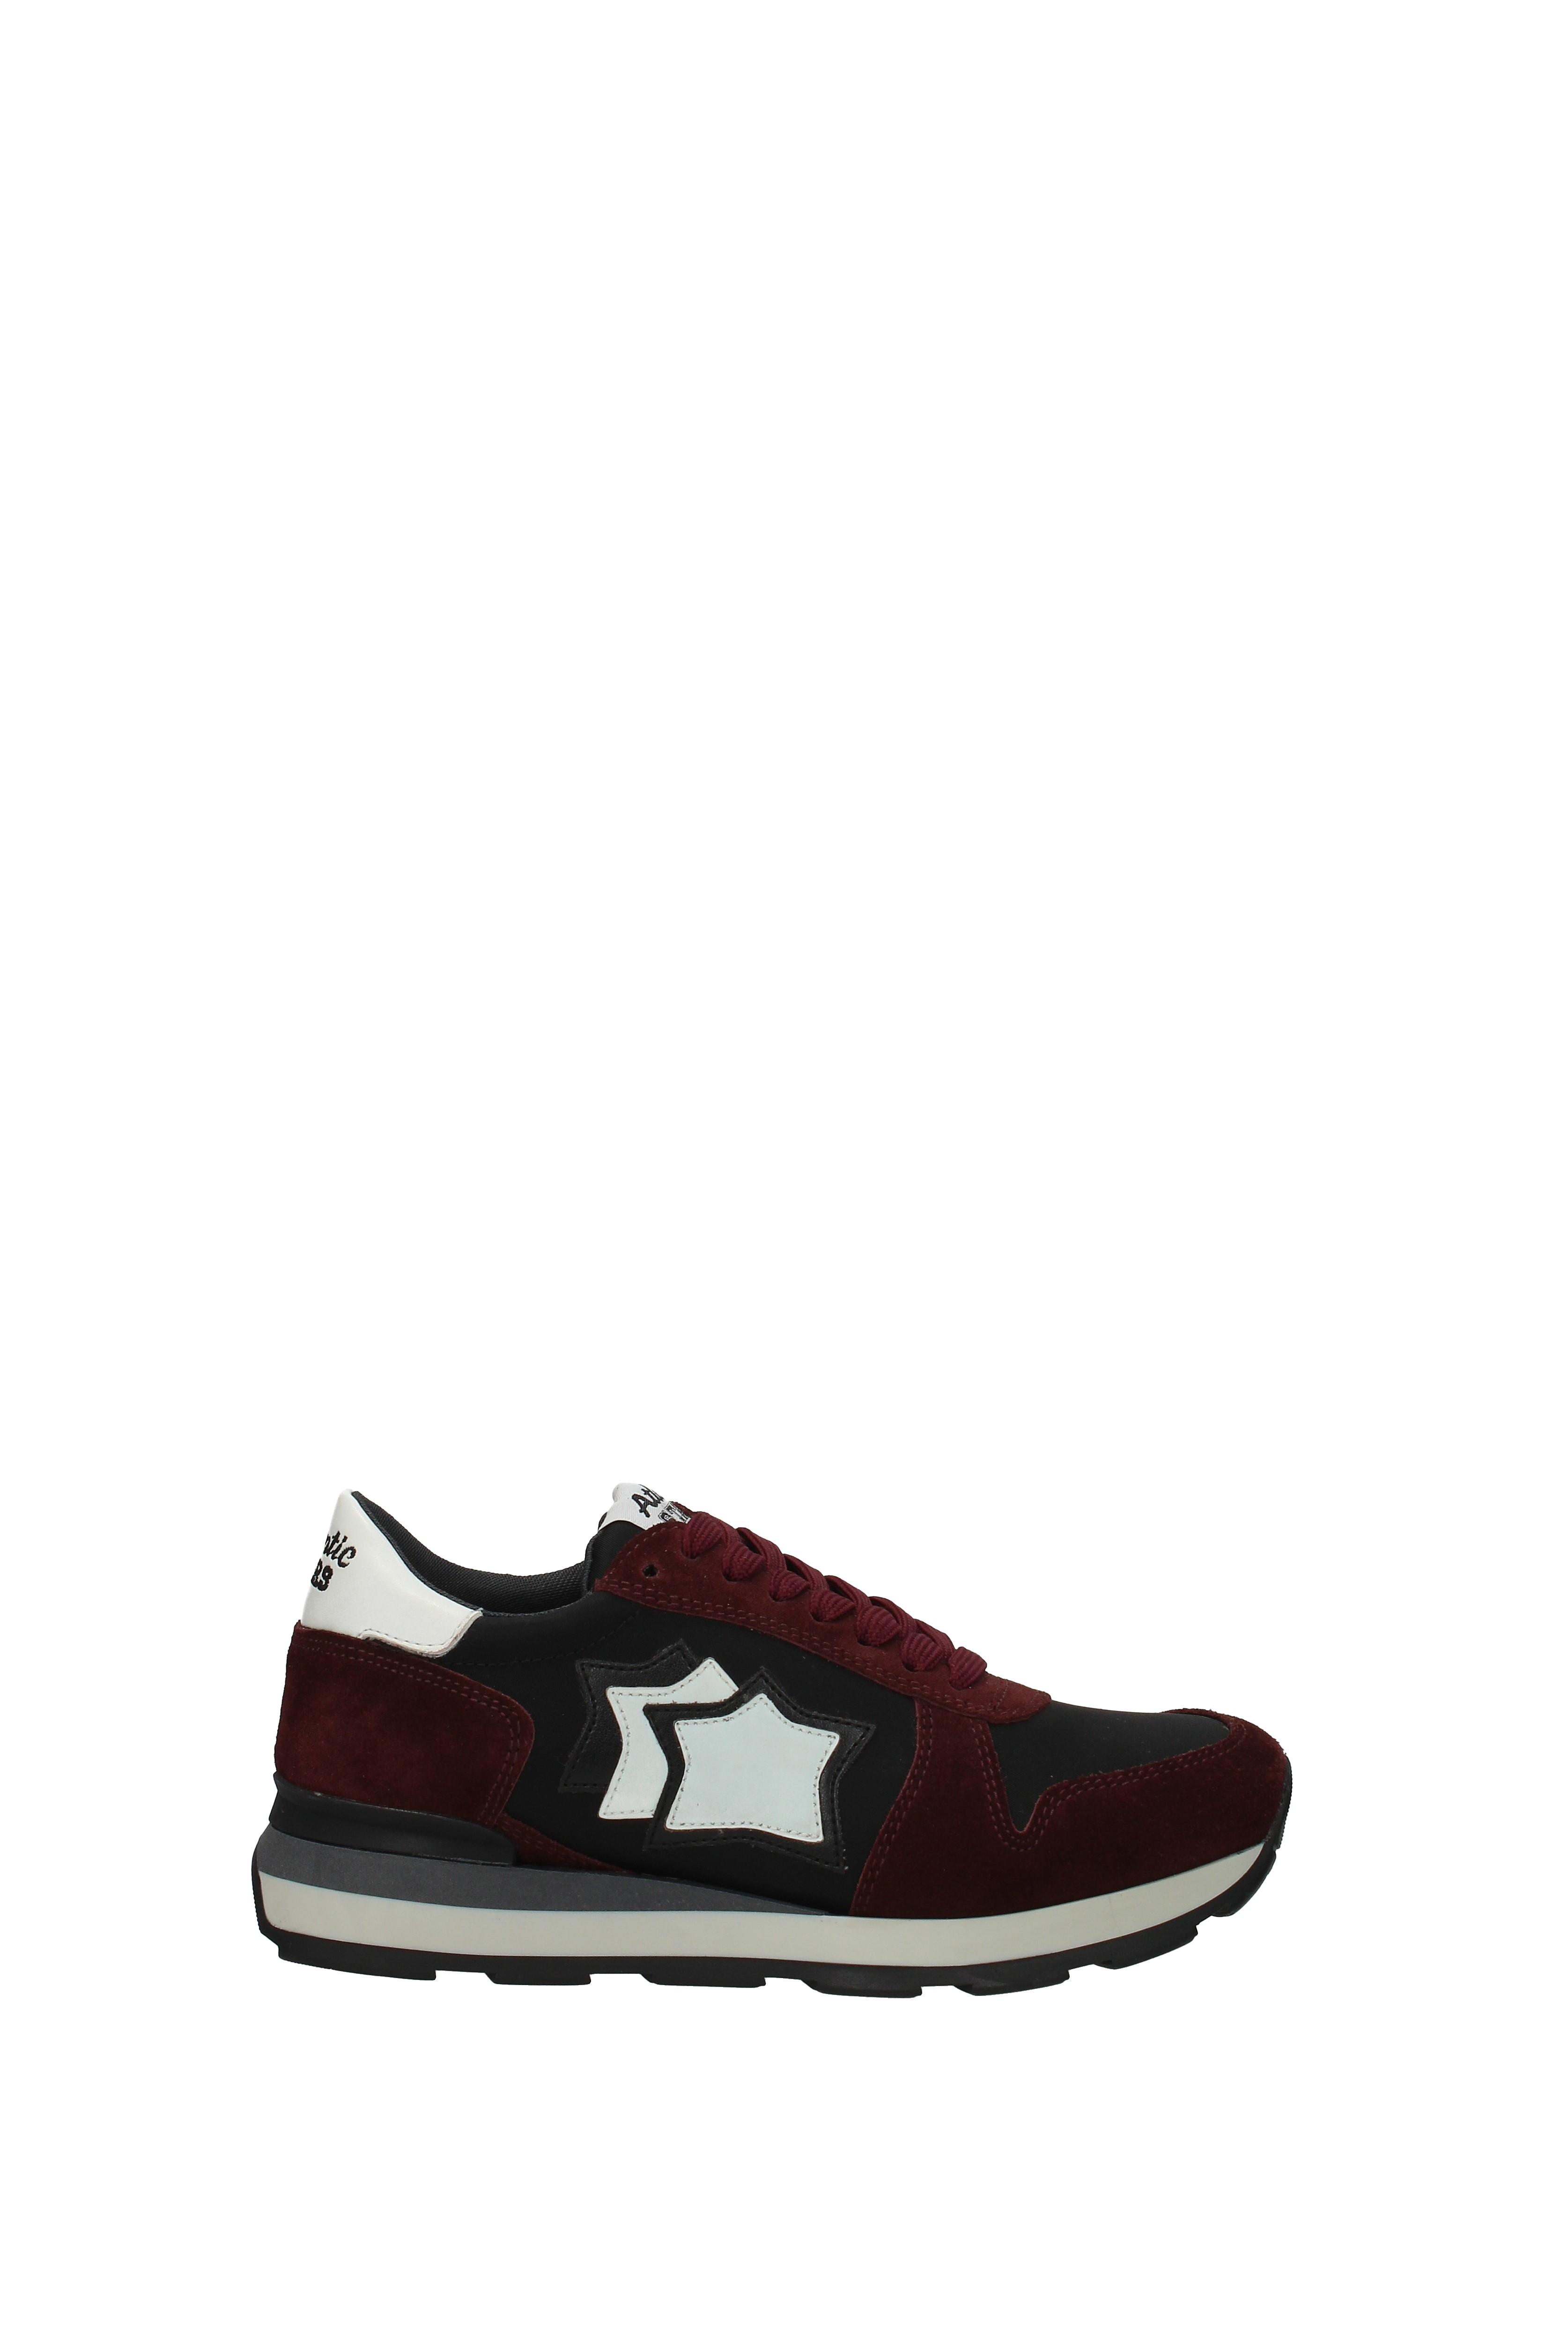 Sneakers Atlantic Stars gemma Damenschuhe (CAMOSCIOGEMMA) - Camoscio (CAMOSCIOGEMMA) Damenschuhe 5904a2